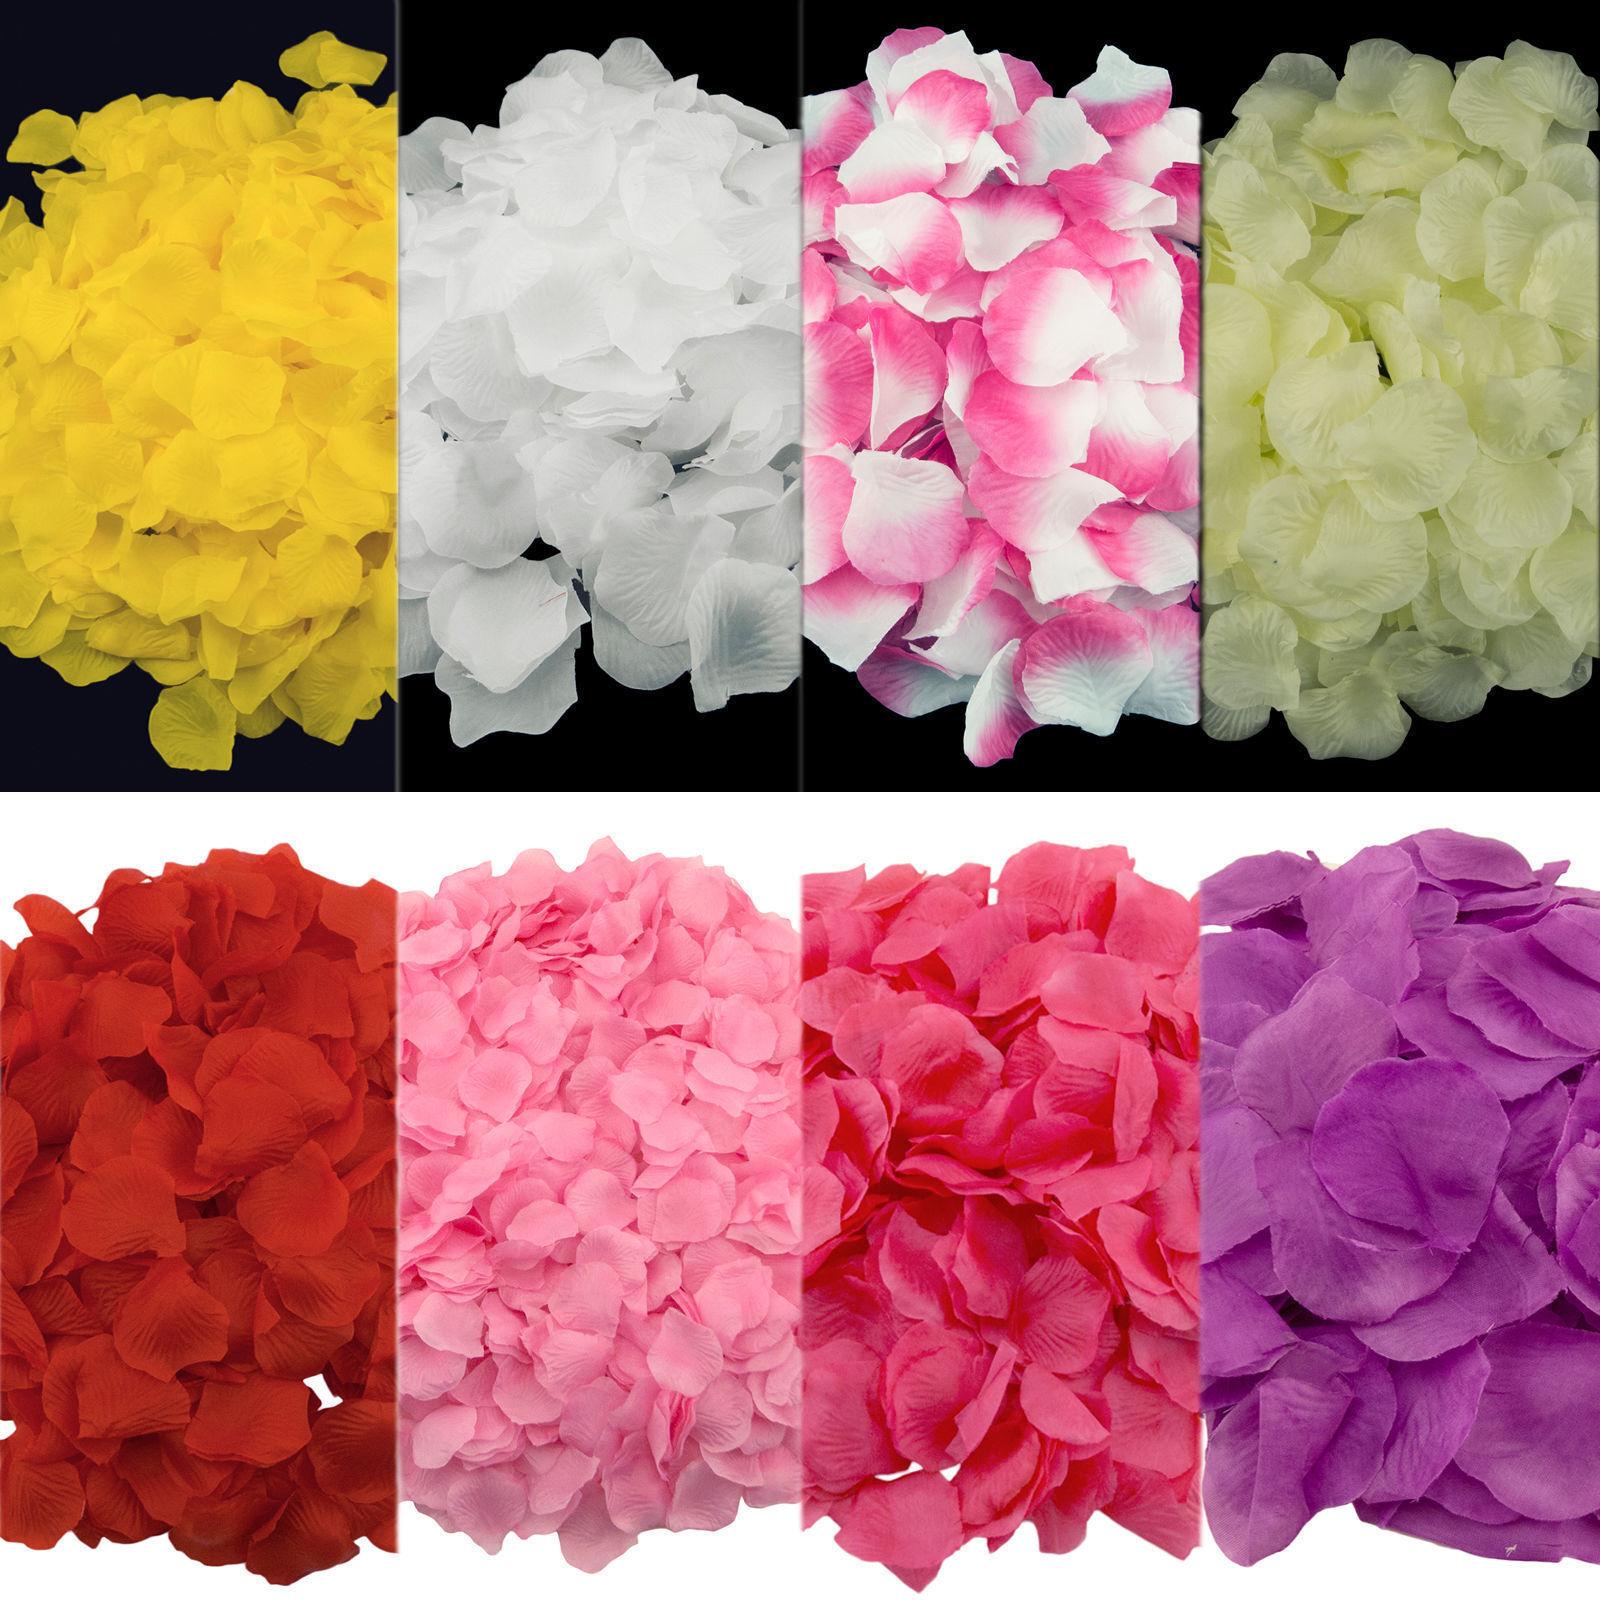 10005000pcs various colors silk flower rose petals wedding party 10005000pcs various colors silk flower rose petals wedding party decorations mightylinksfo